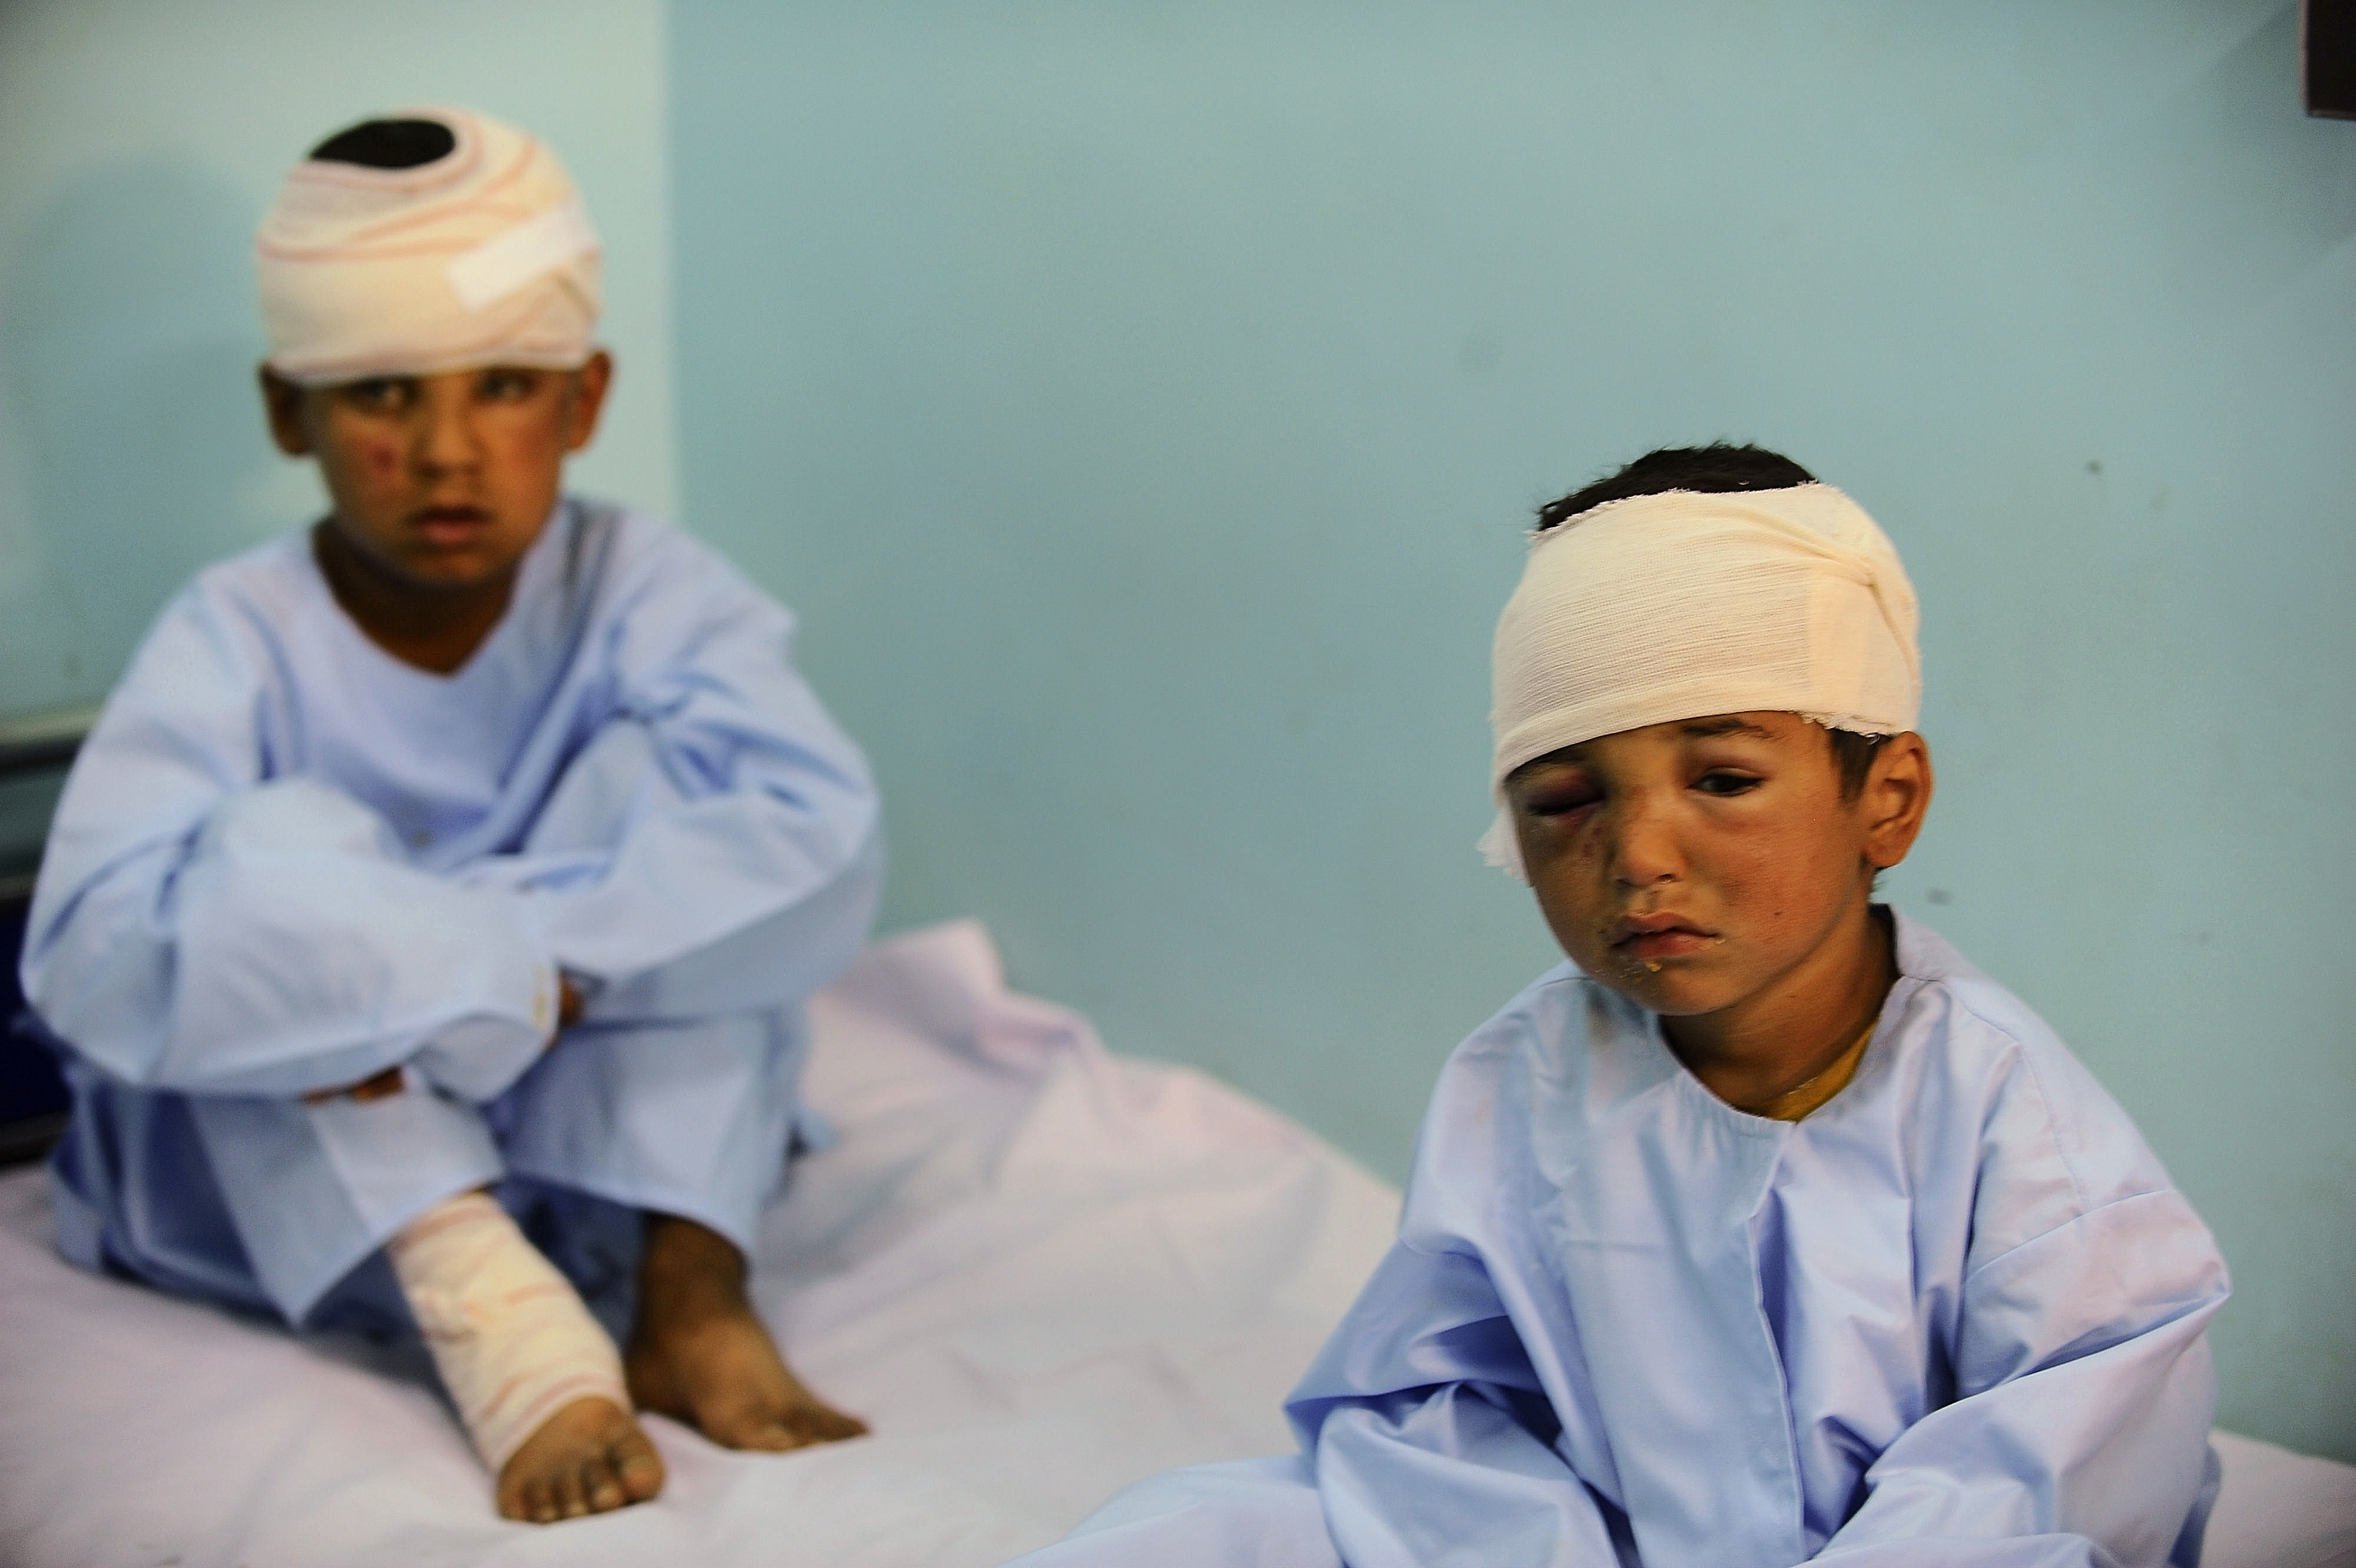 Afghan child casualties soar as urban warfare intensifies: UN